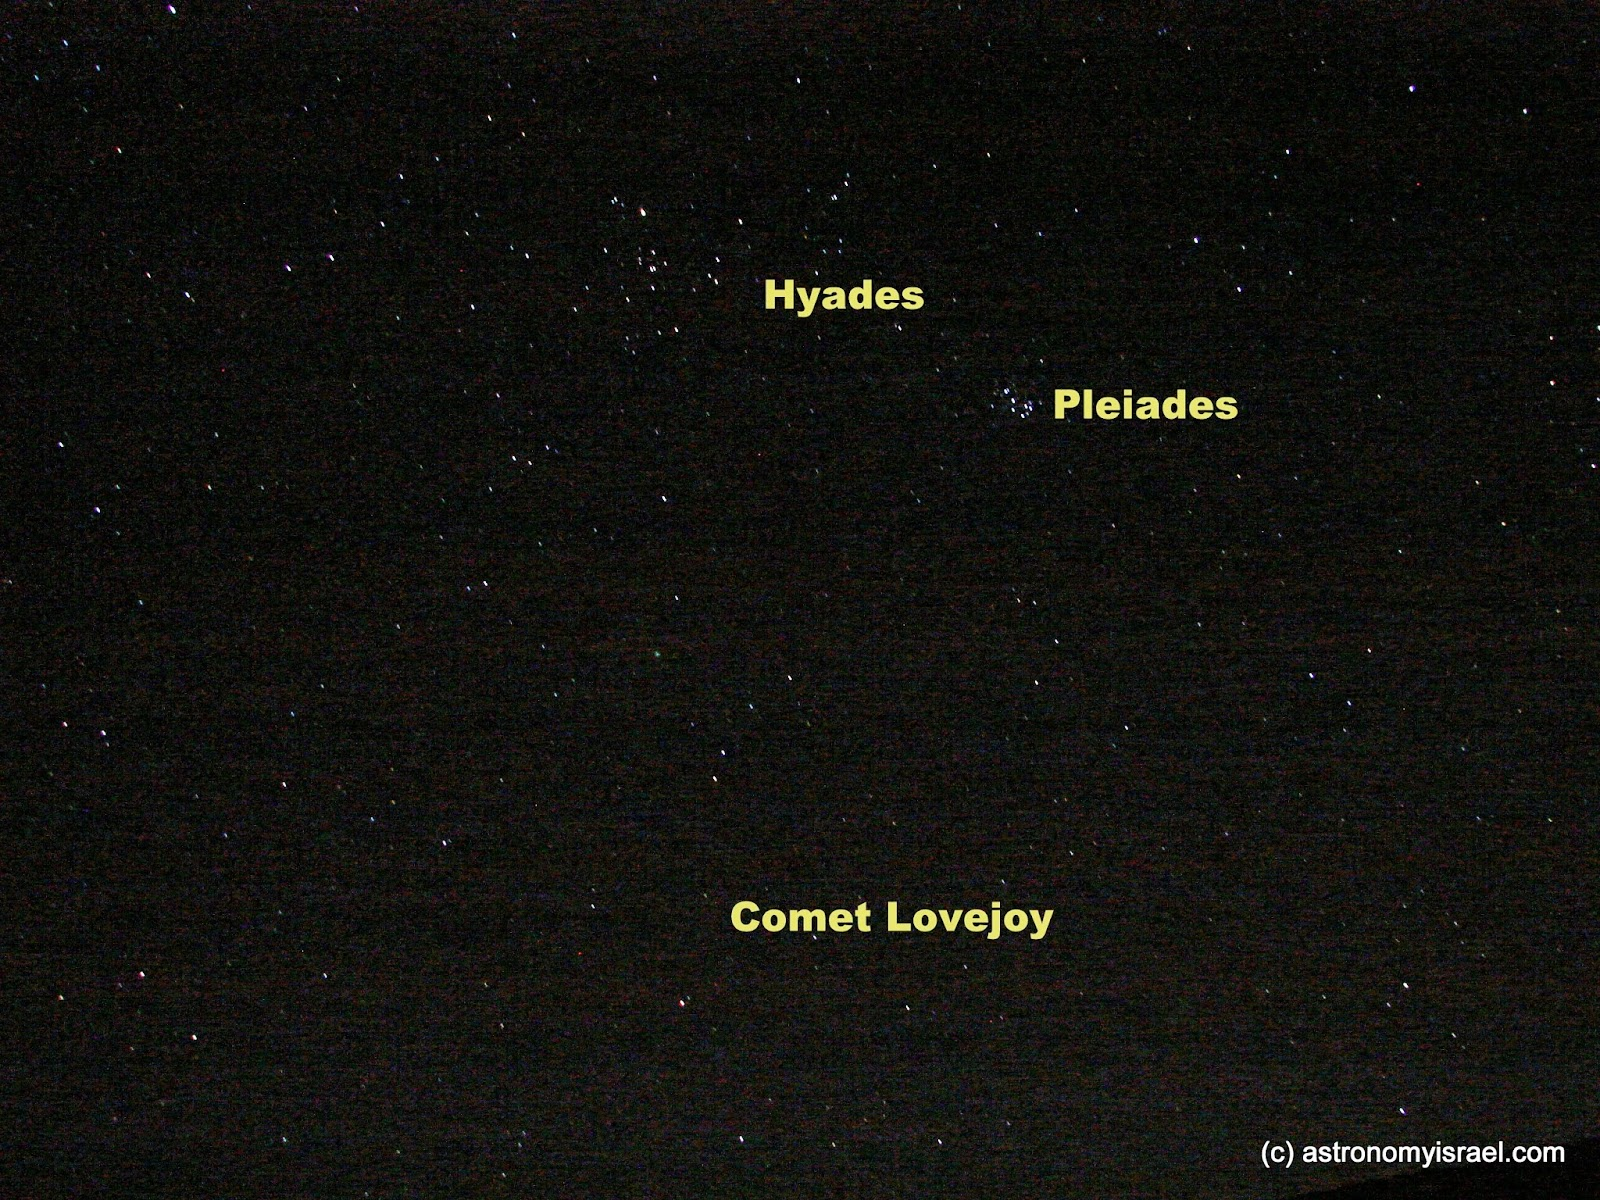 Comet Lovejoy, Pleiades, Hyades, Mitzpe Ramon, Astronomy Israel